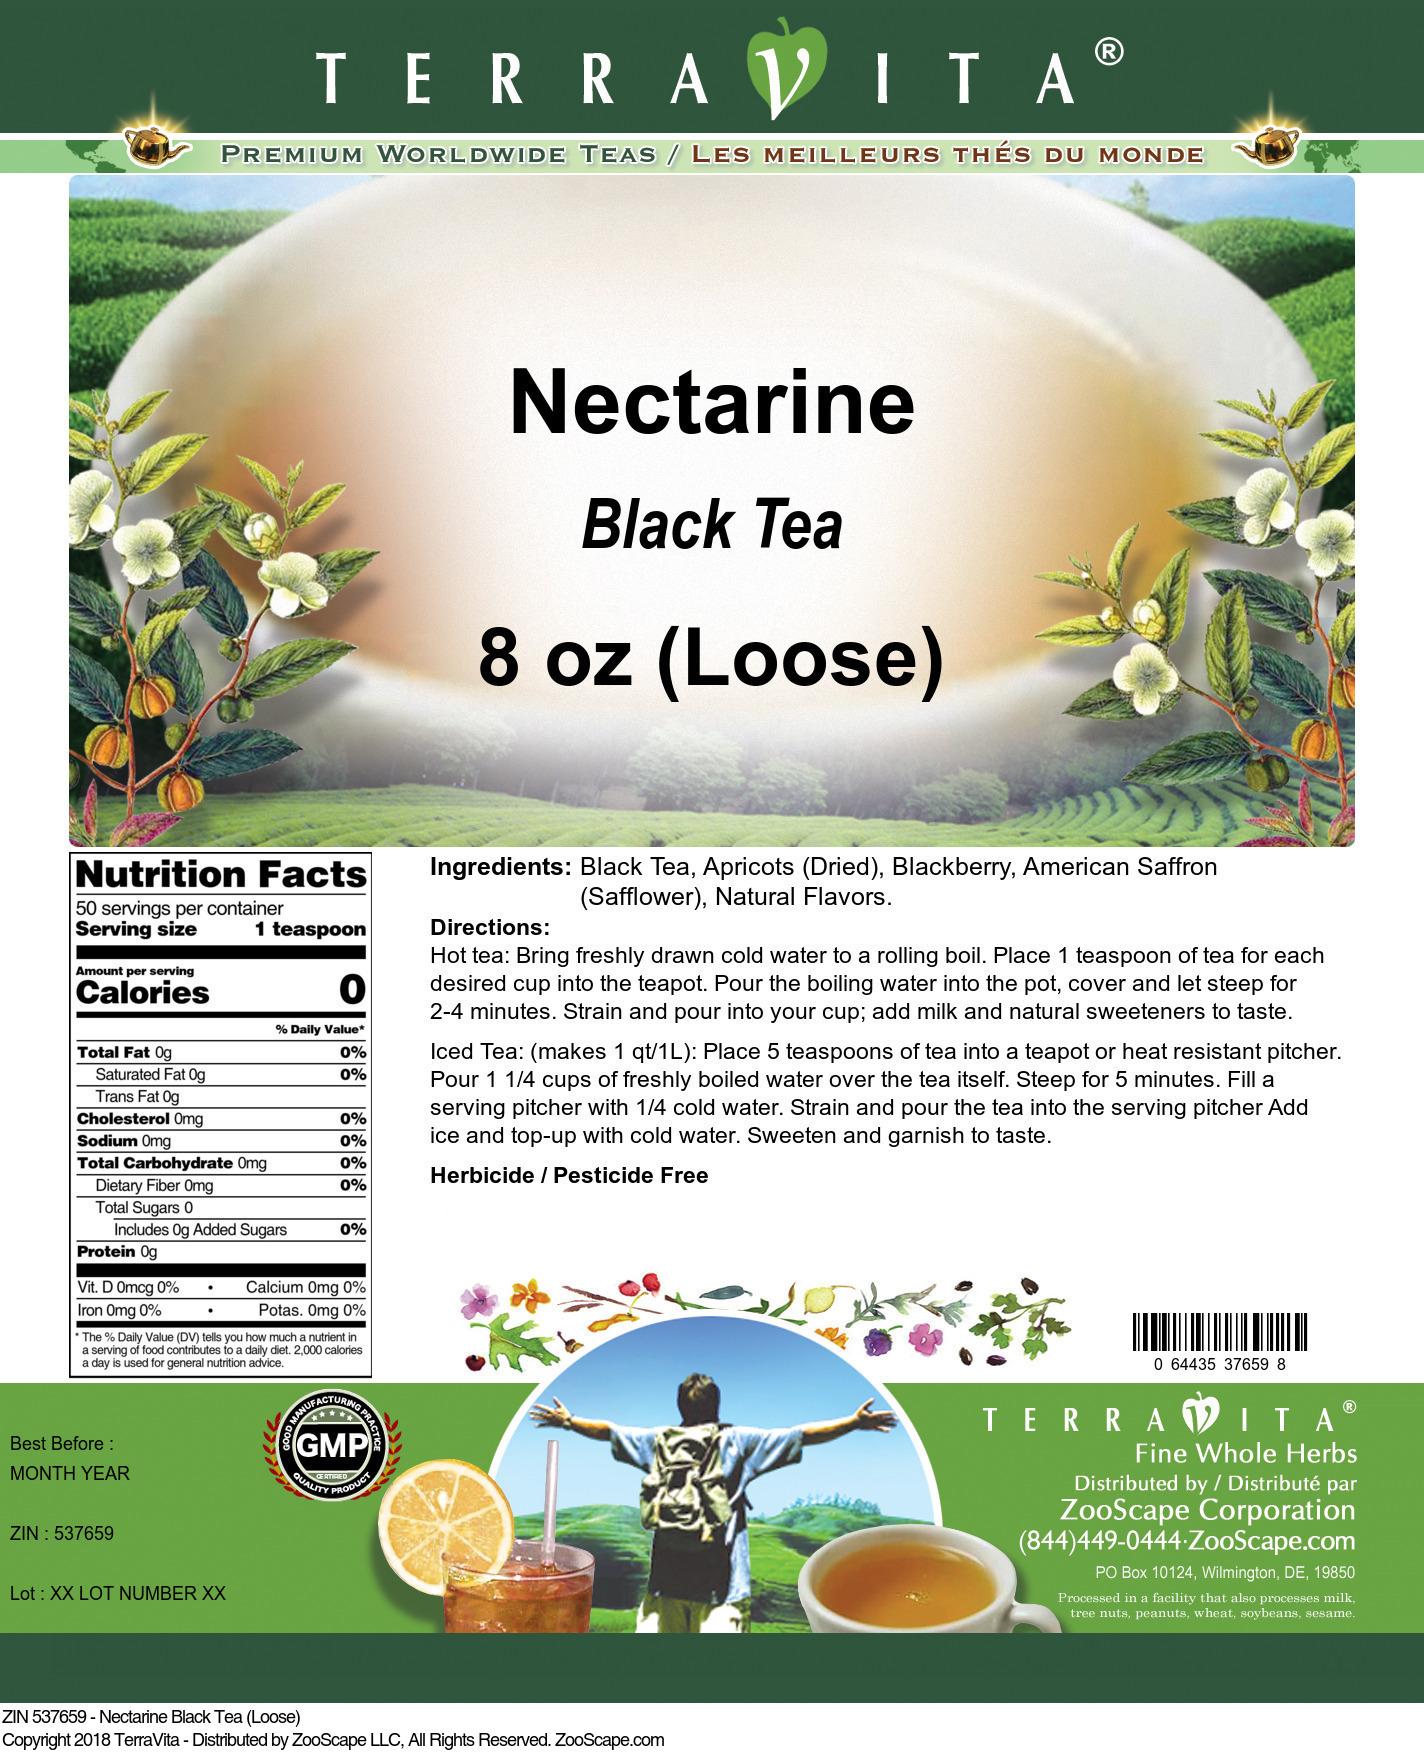 Nectarine Black Tea